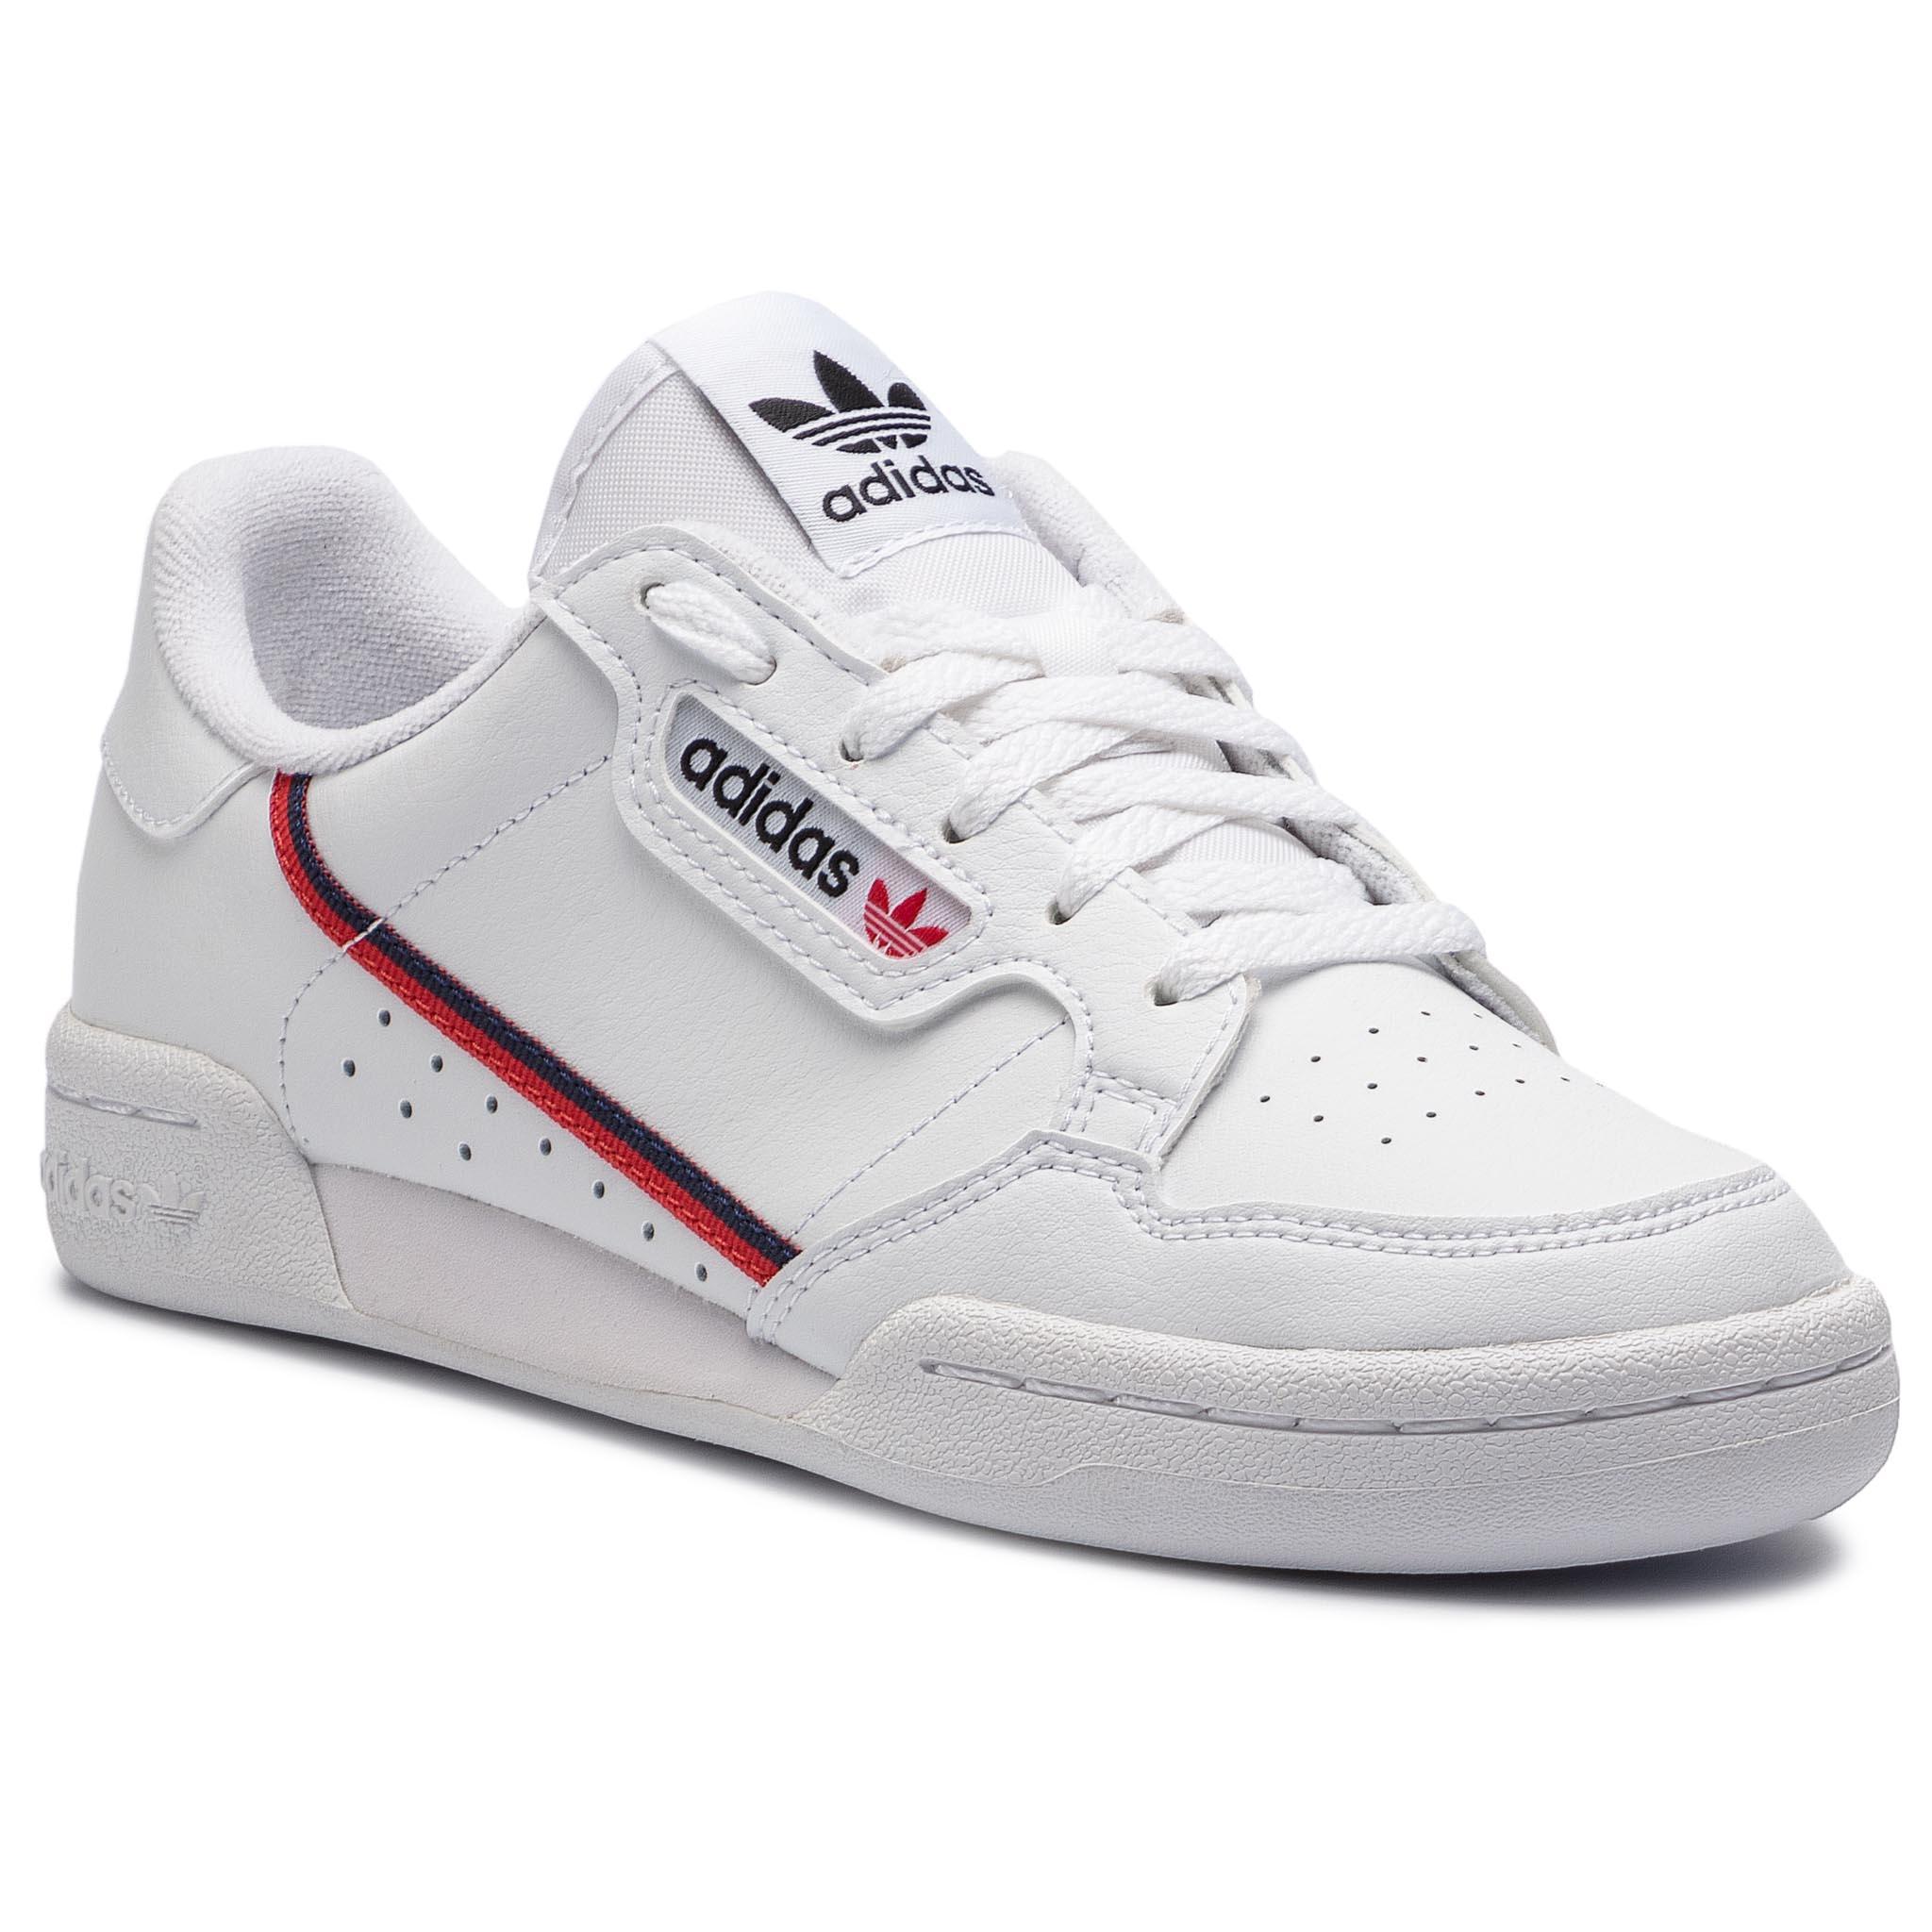 560251c Ctas Converse Lift Sneakers Ox Whiteblackwhite 354jALqR